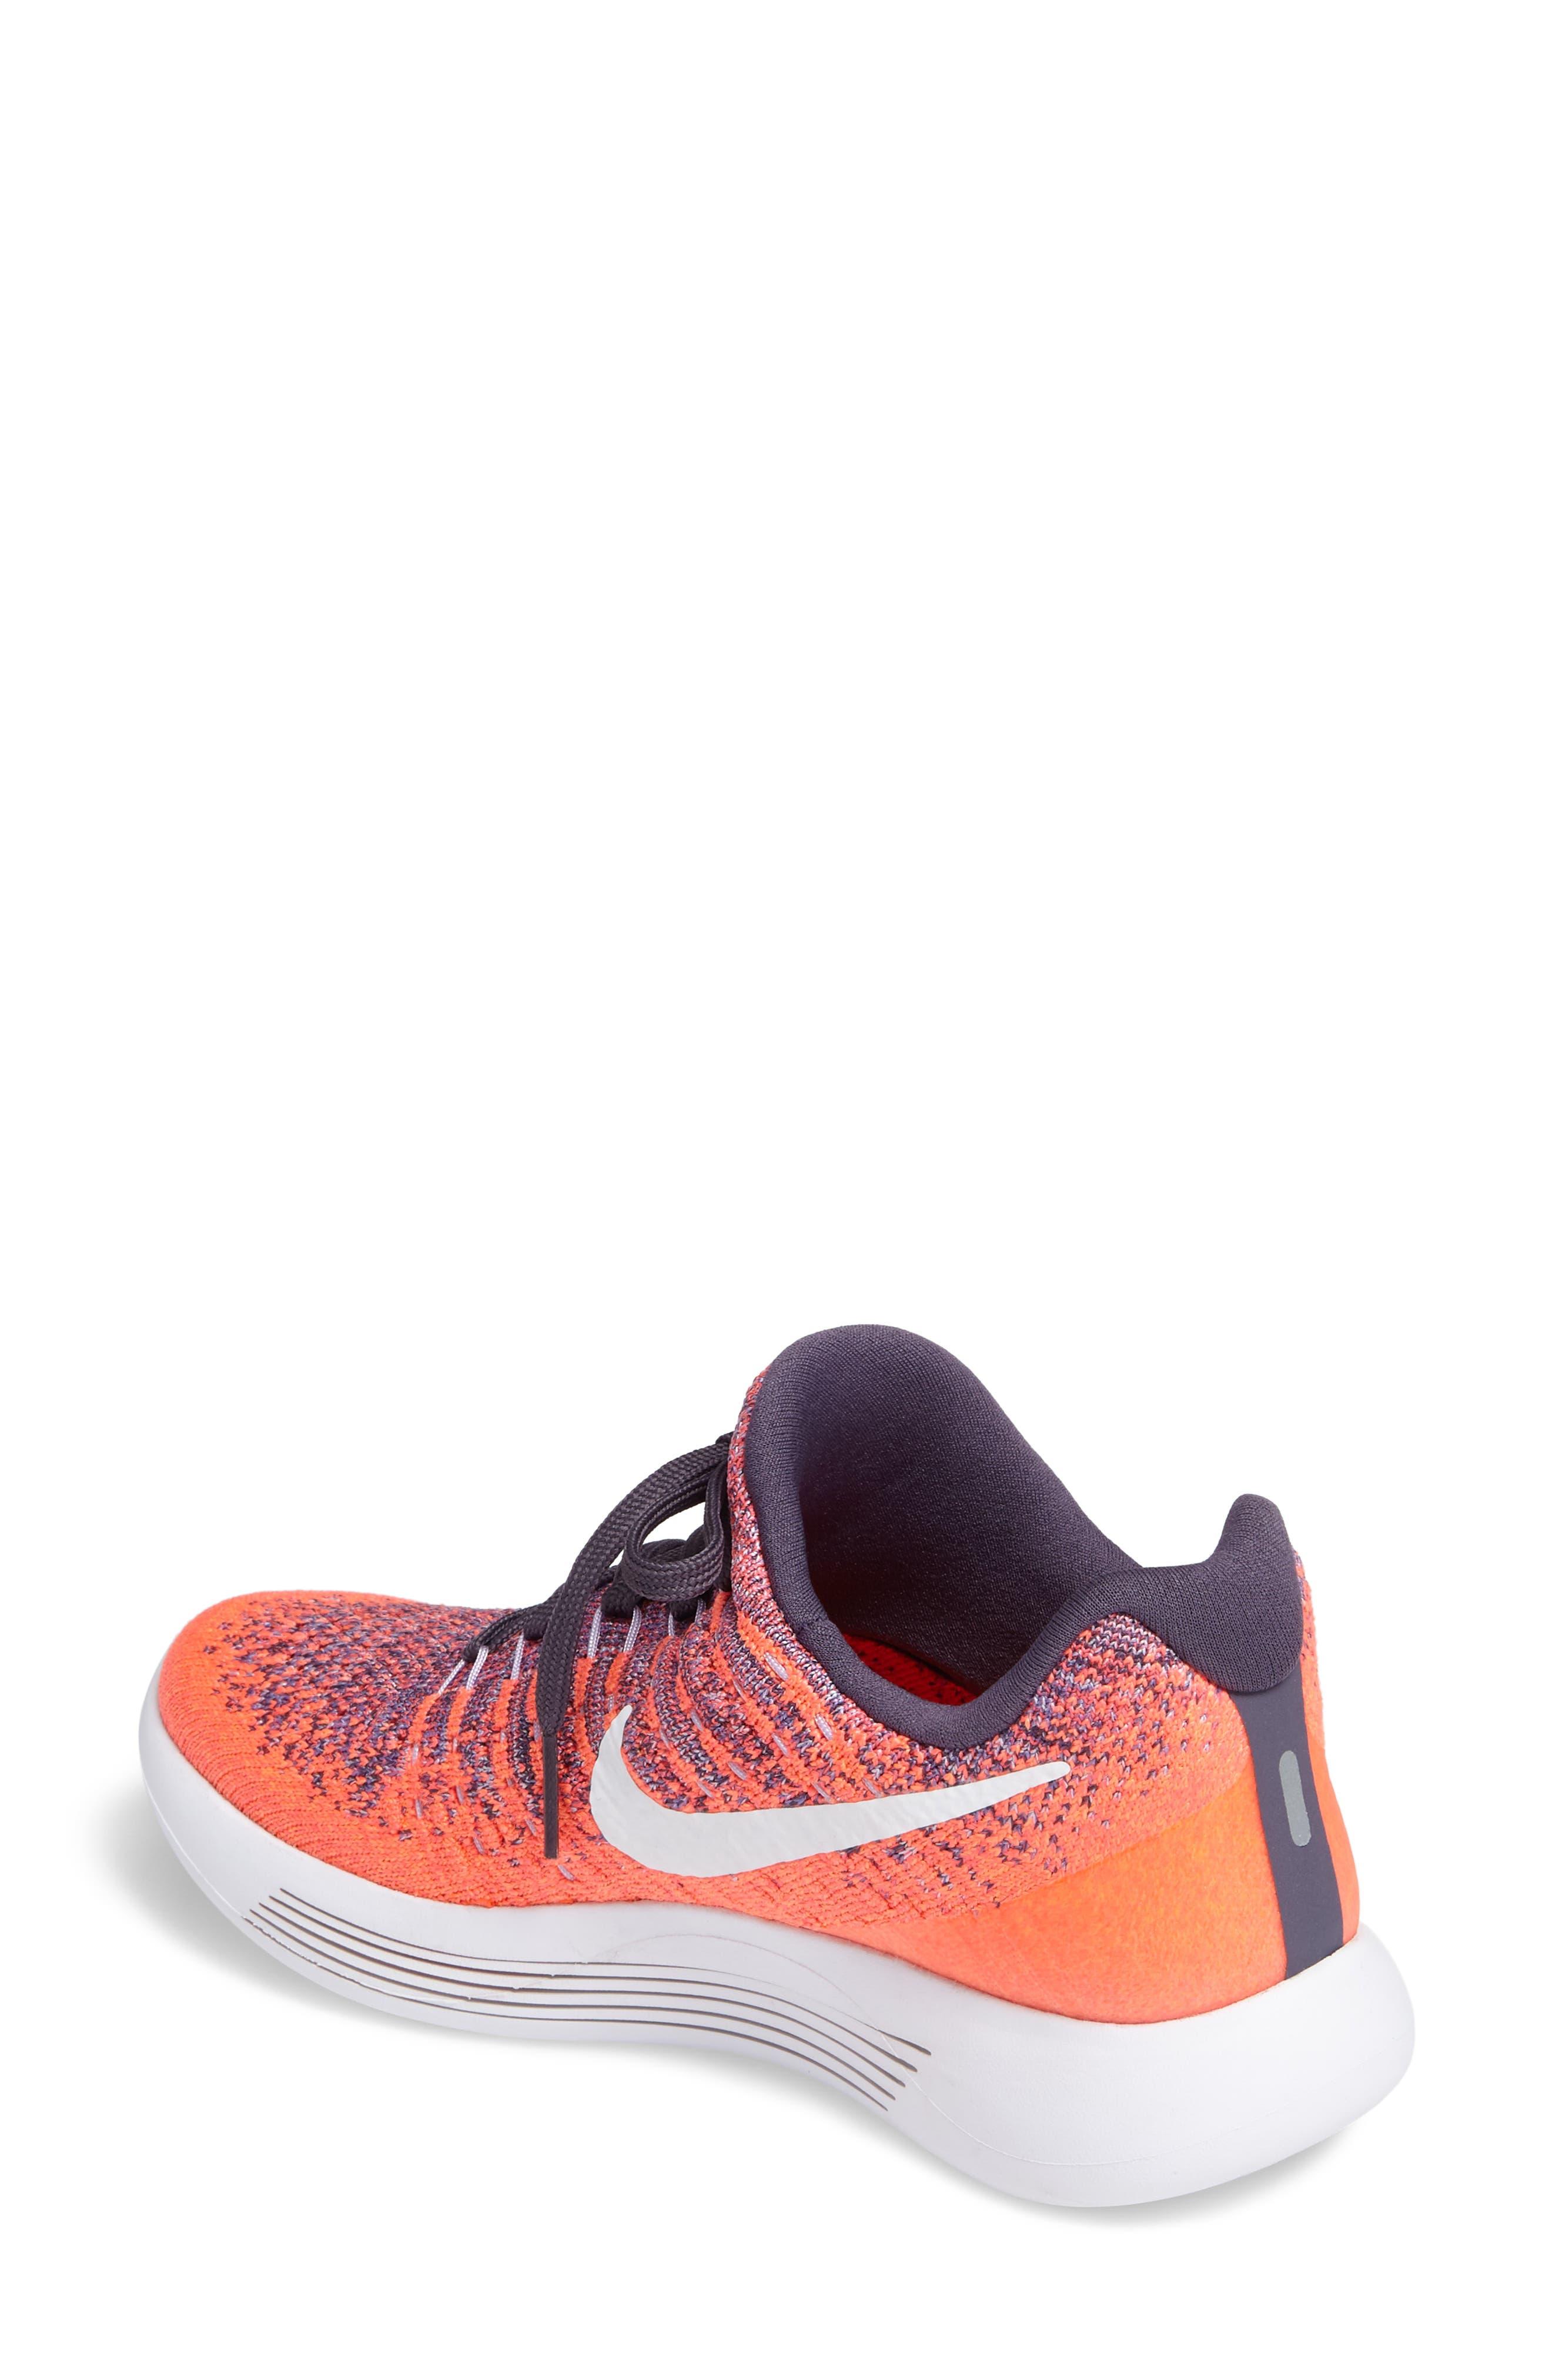 LunarEpic Low Flyknit 2 Running Shoe,                             Alternate thumbnail 41, color,